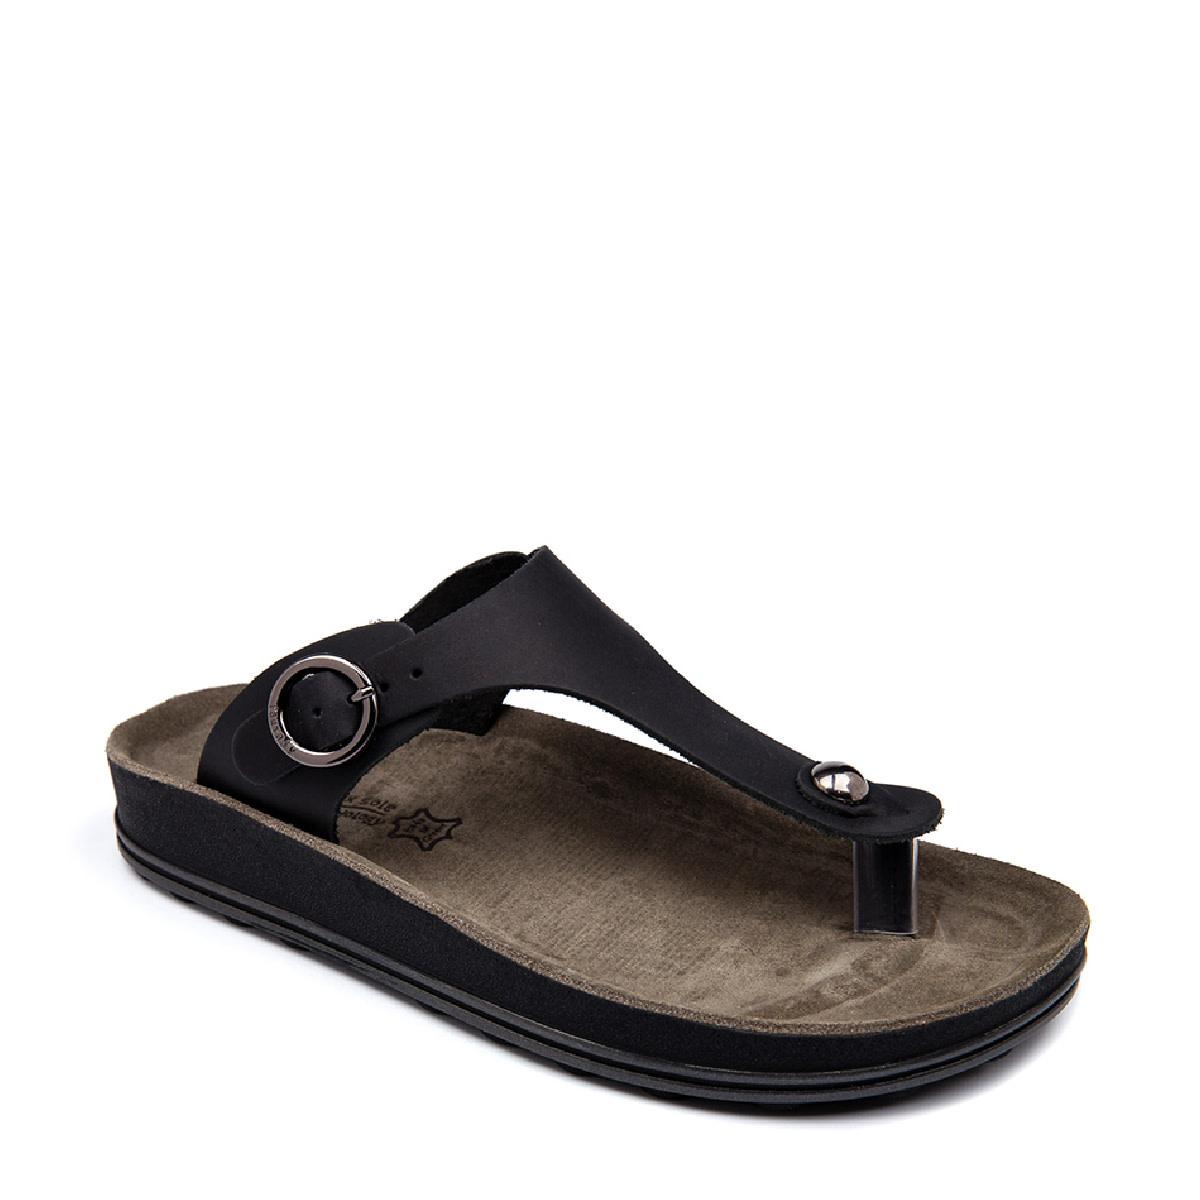 Fantasy Sandals Arianna Black Brush